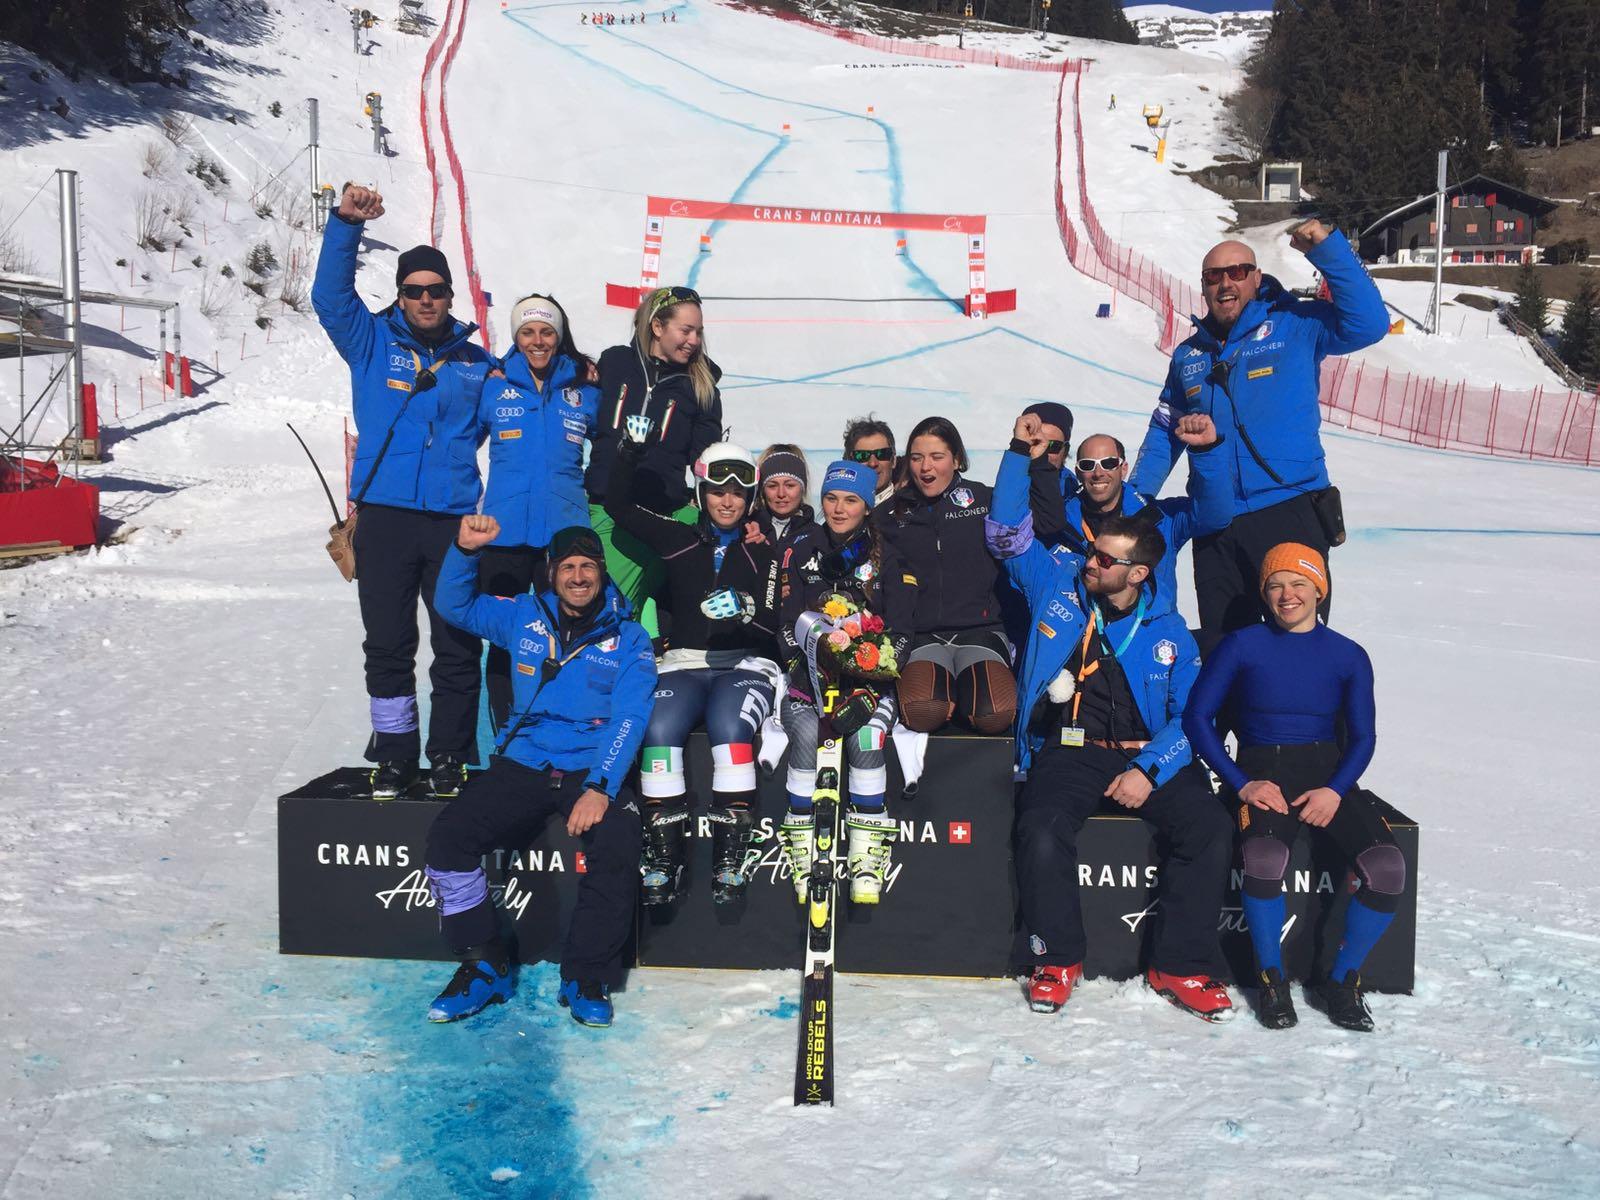 Festa azzurra sul podio a Crans Montana